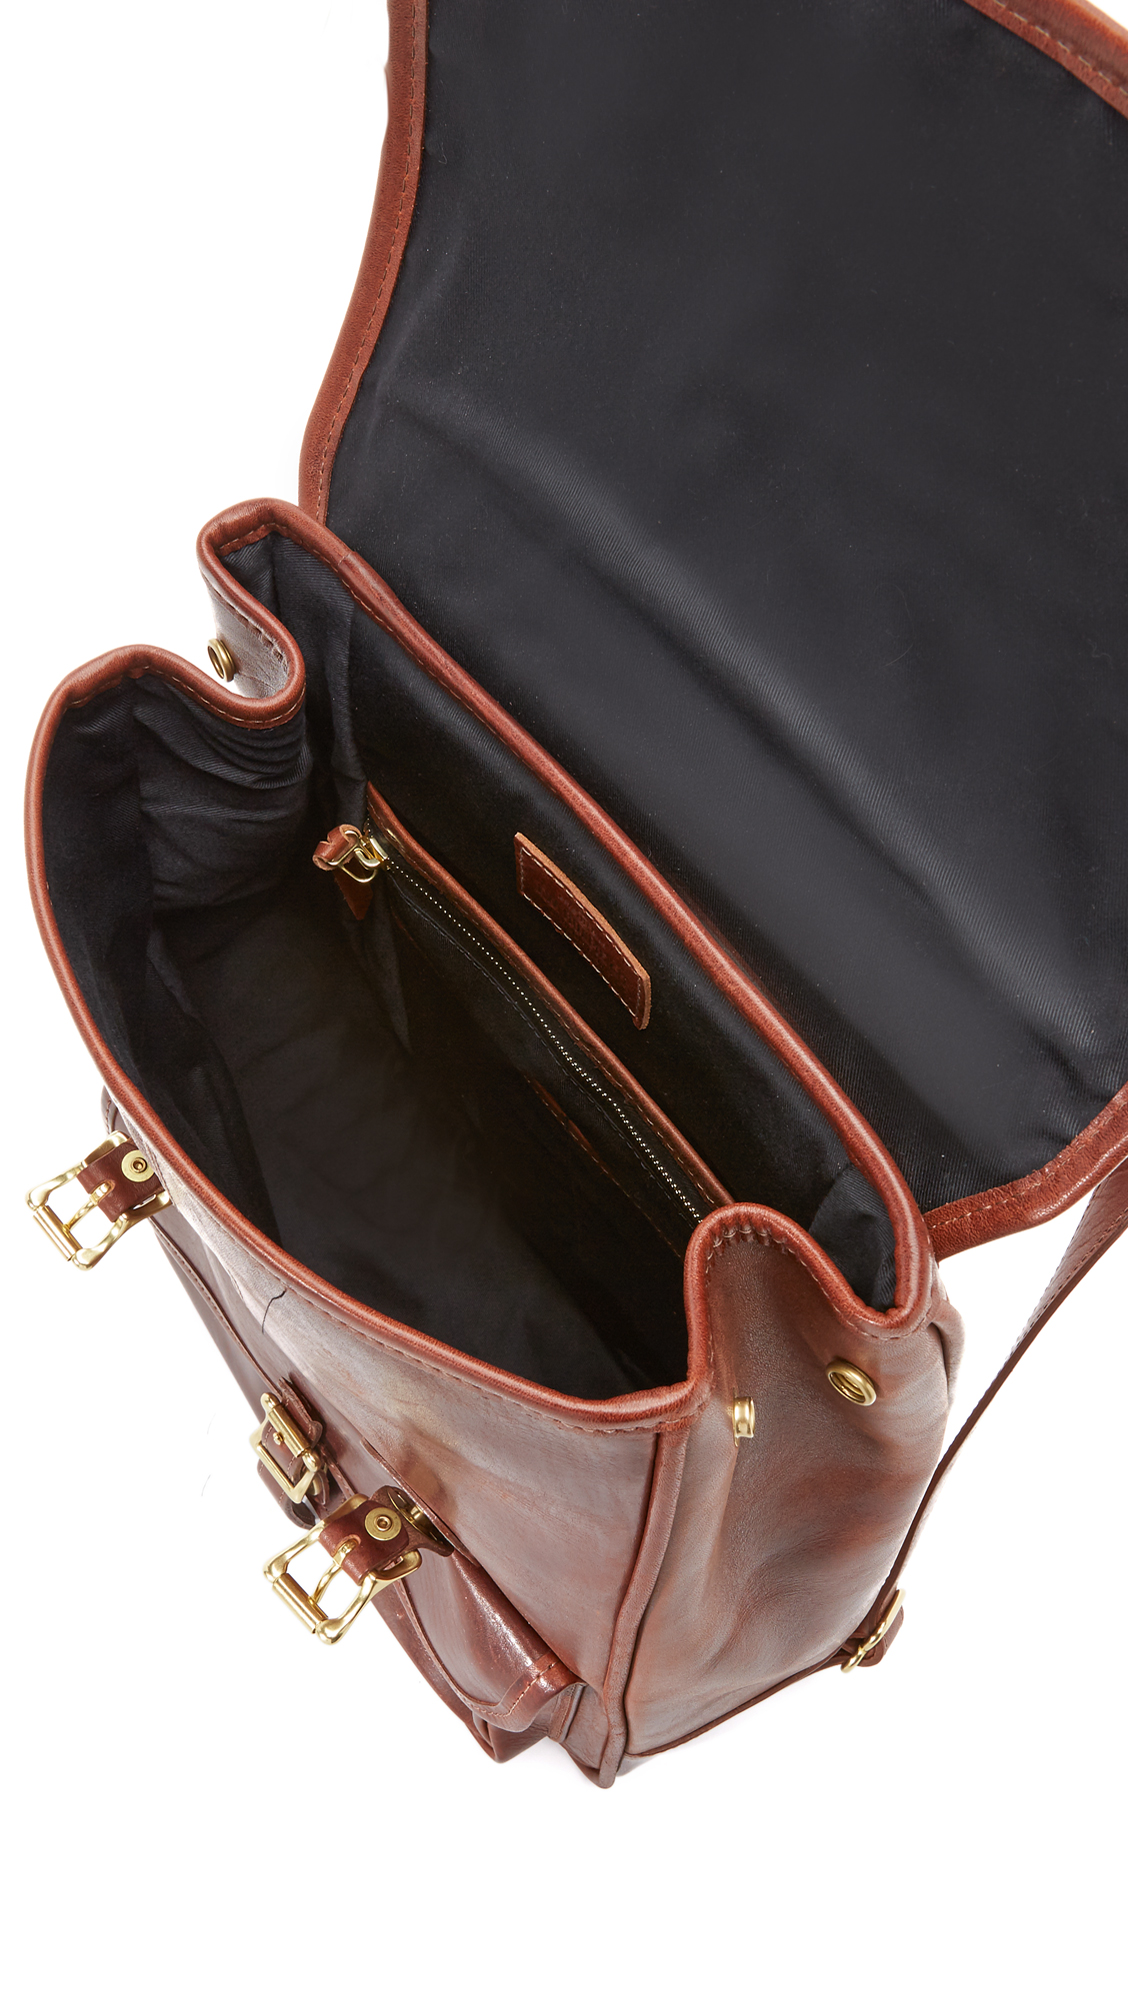 d9cb8c024ab8 J.W. Hulme Co. Continental Backpack